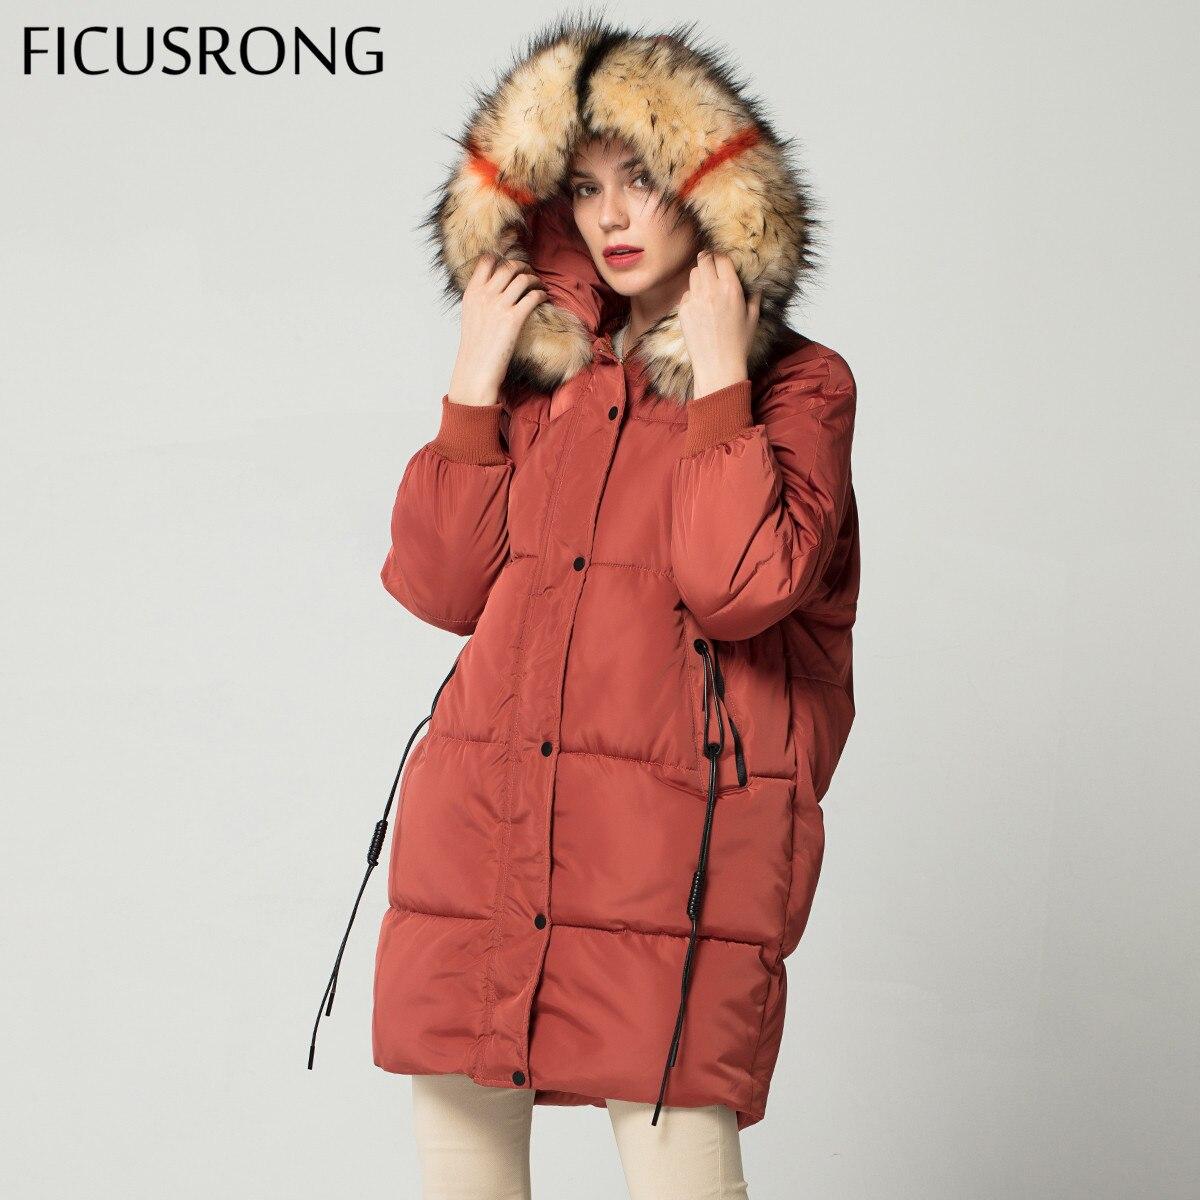 Fashion Plus Size Loose Warm Winter Jacket Women Hooded Fur Coat Down Parkas Long Cotton Padded Jacket Female FICUSRONG